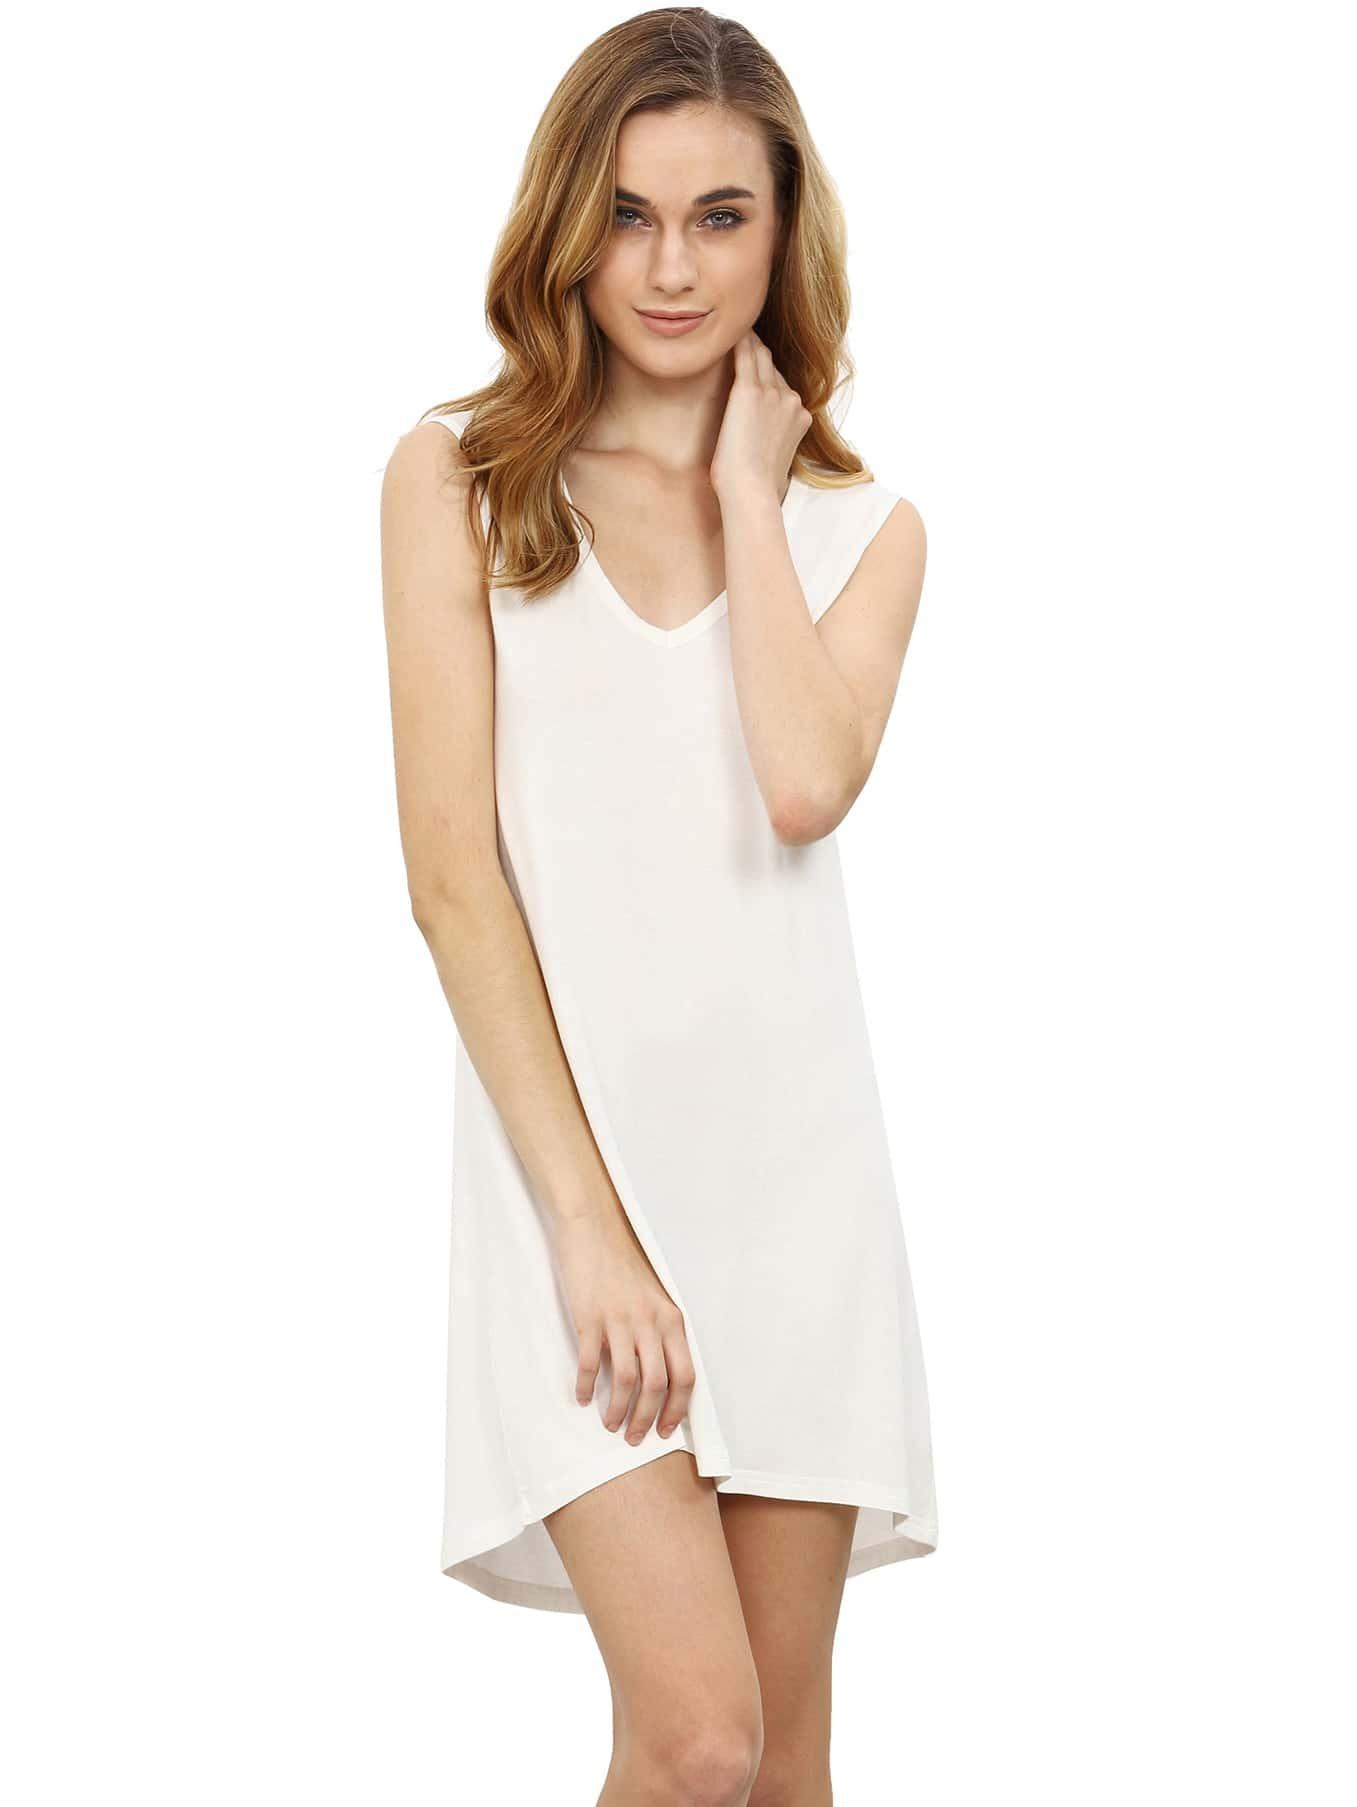 V-Neckline Dip Hem Tank Dress dress160513781